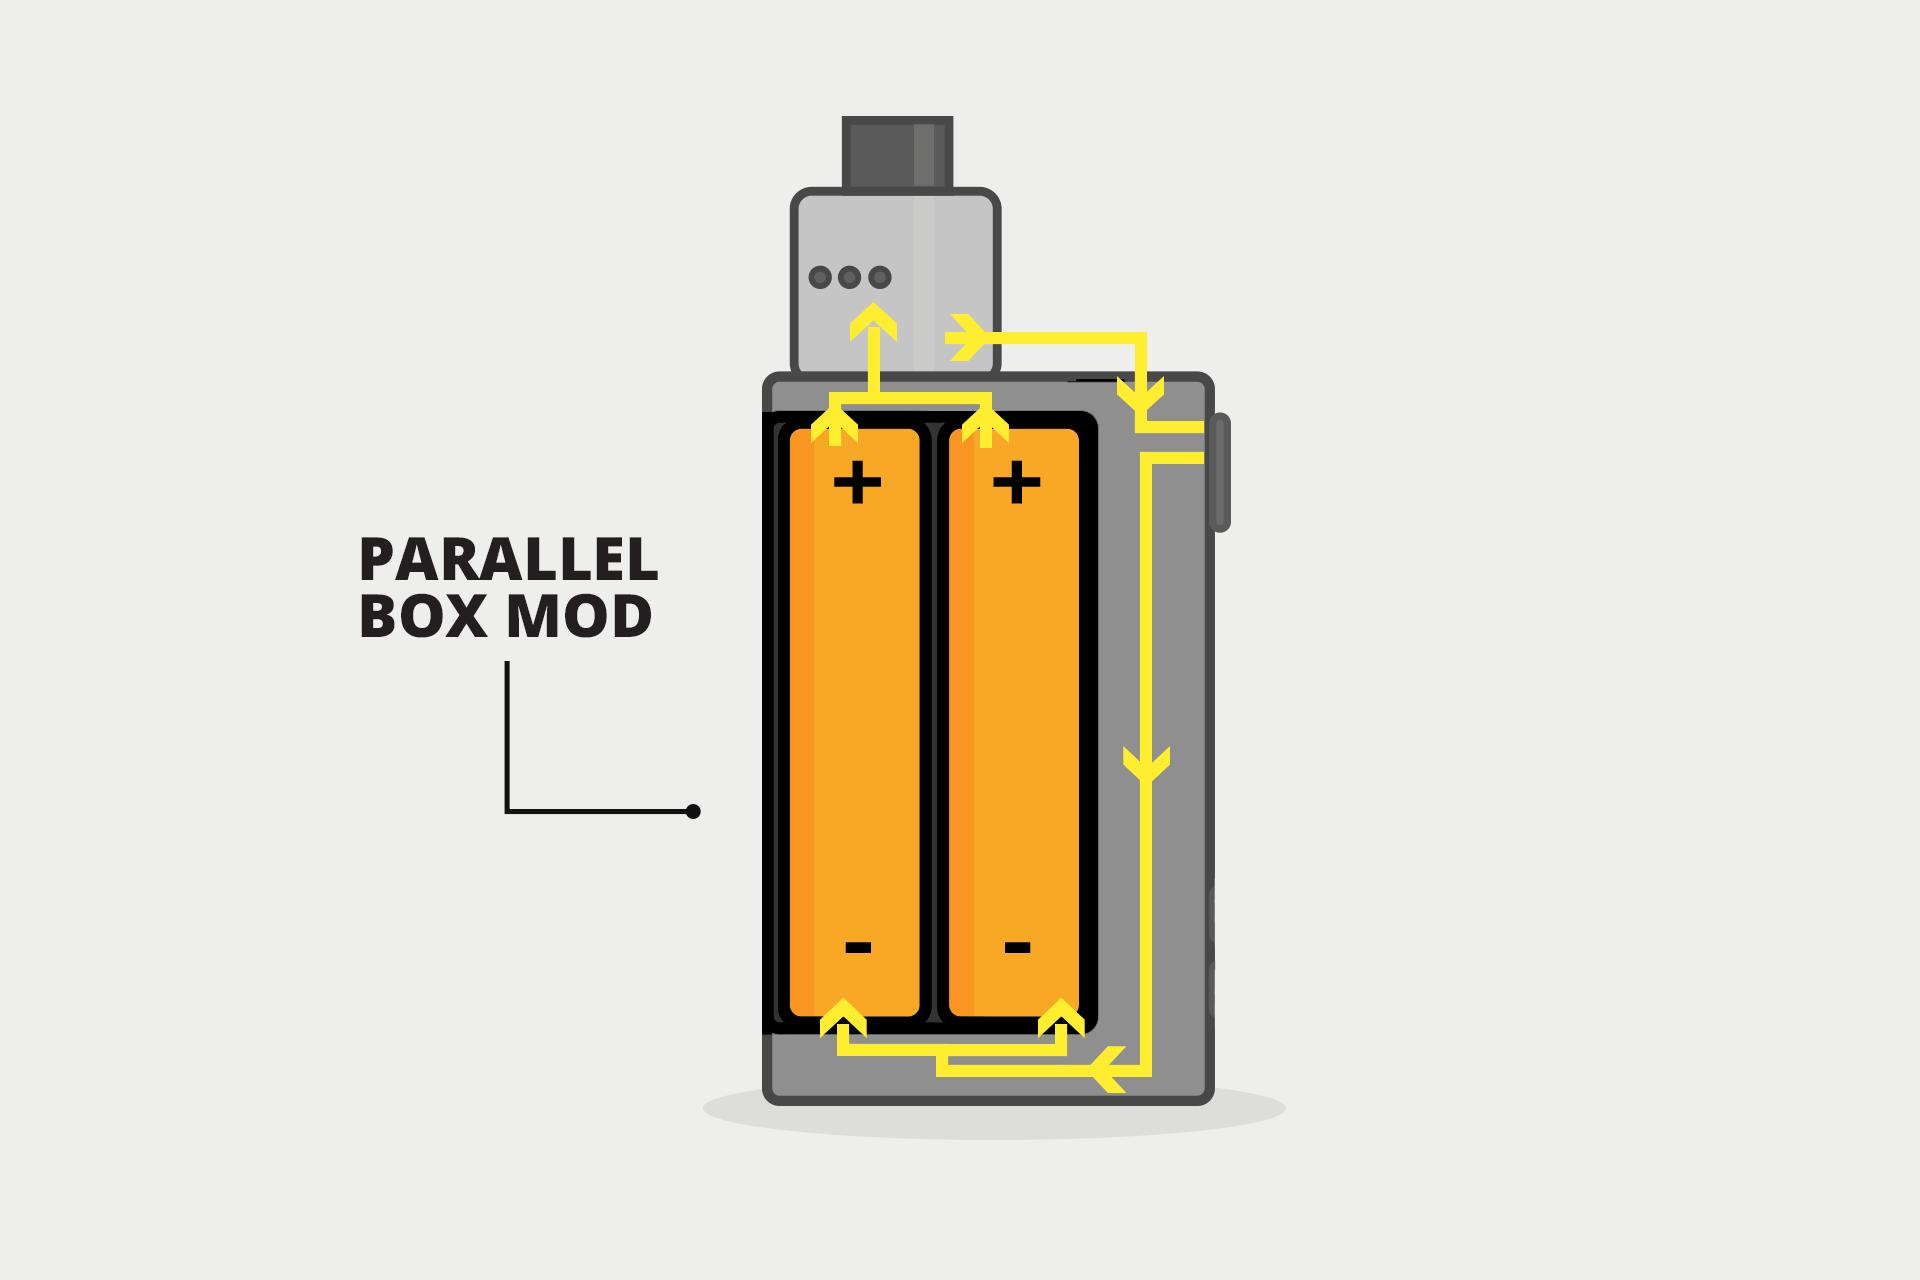 Parallel box mod circuit